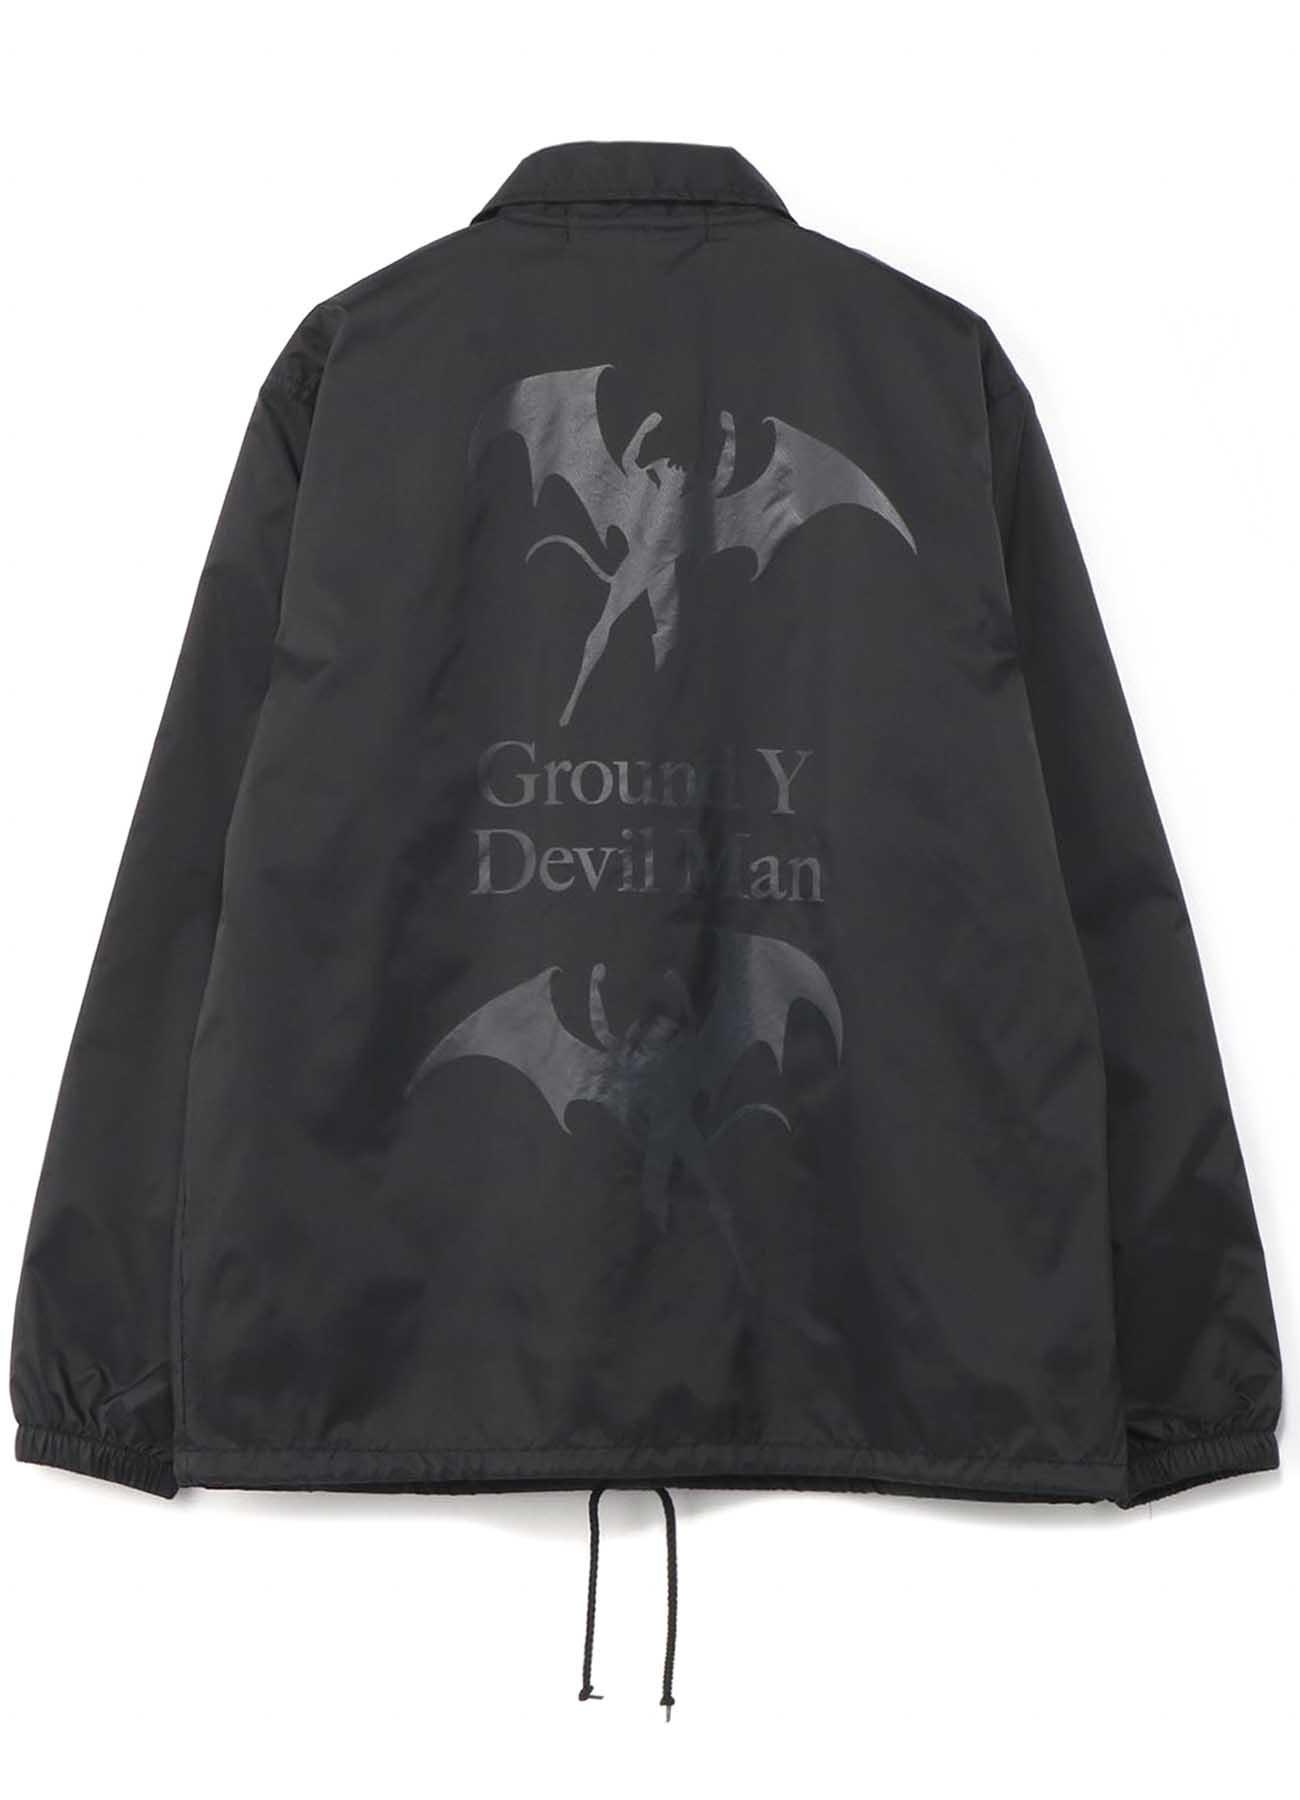 DEVILMAN-デビルマン- Collaboration Coach Jacket